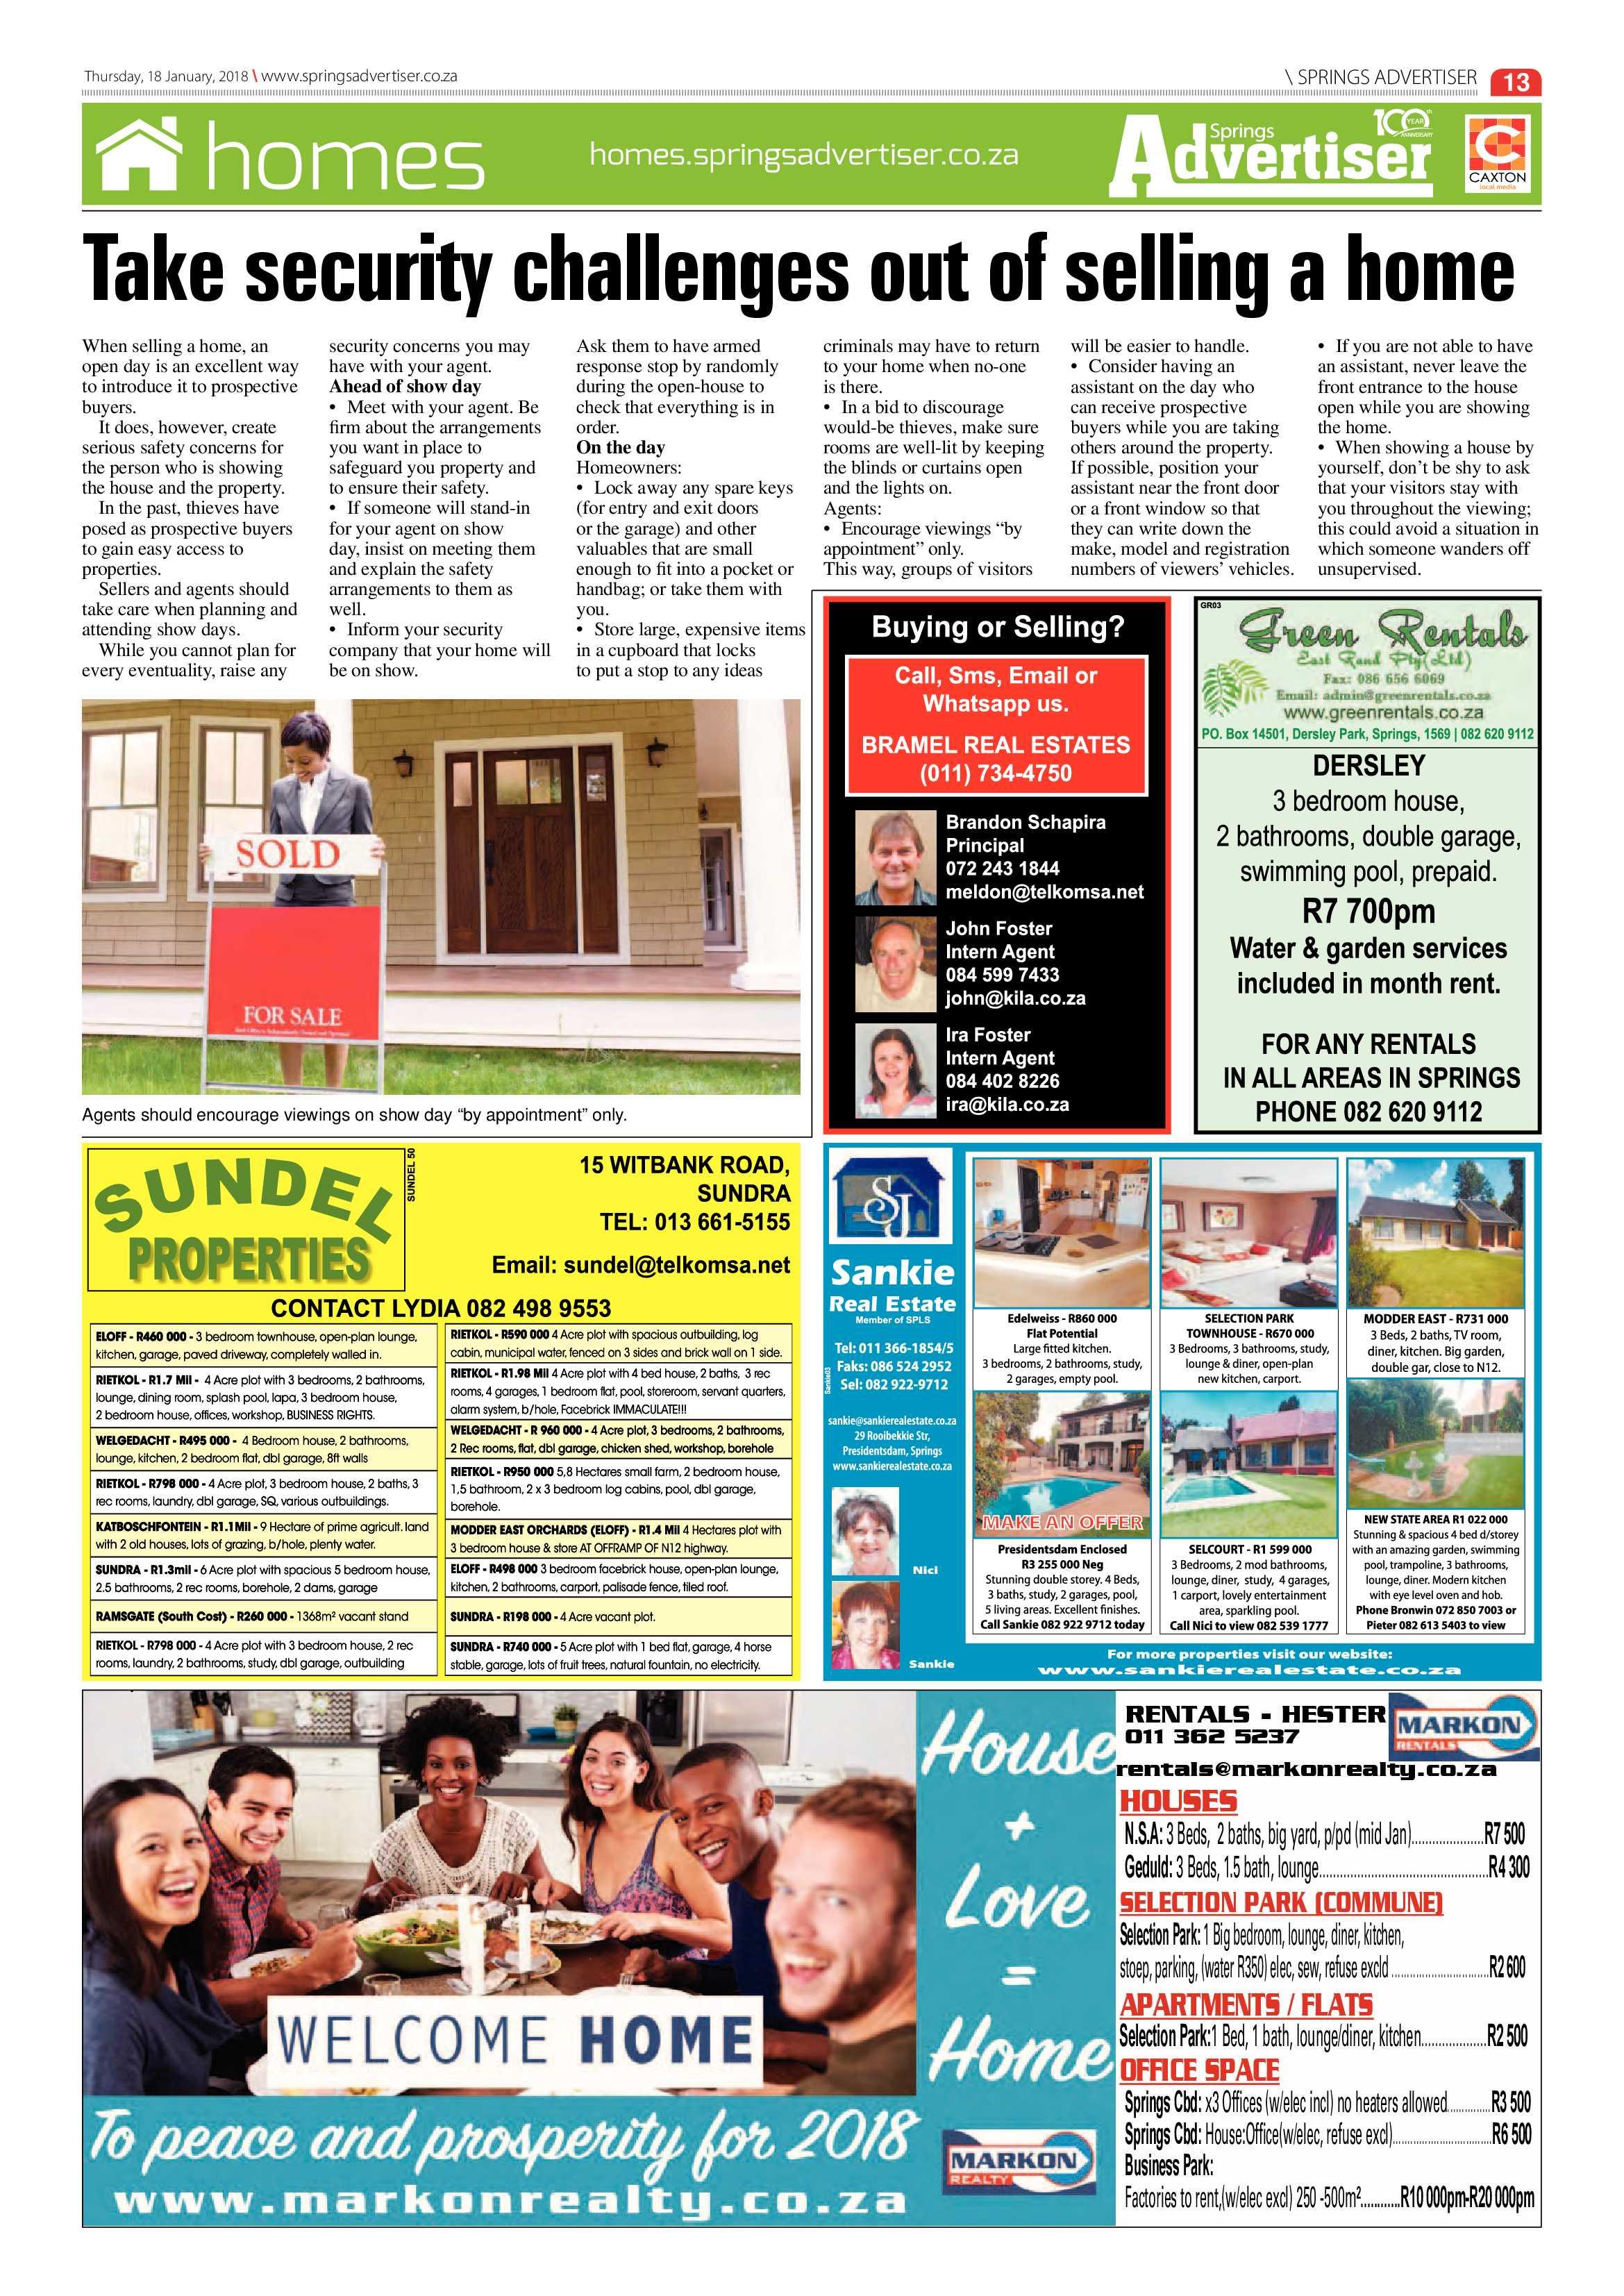 Springs Advertiser 18 January 2018 | Springs Advertiser